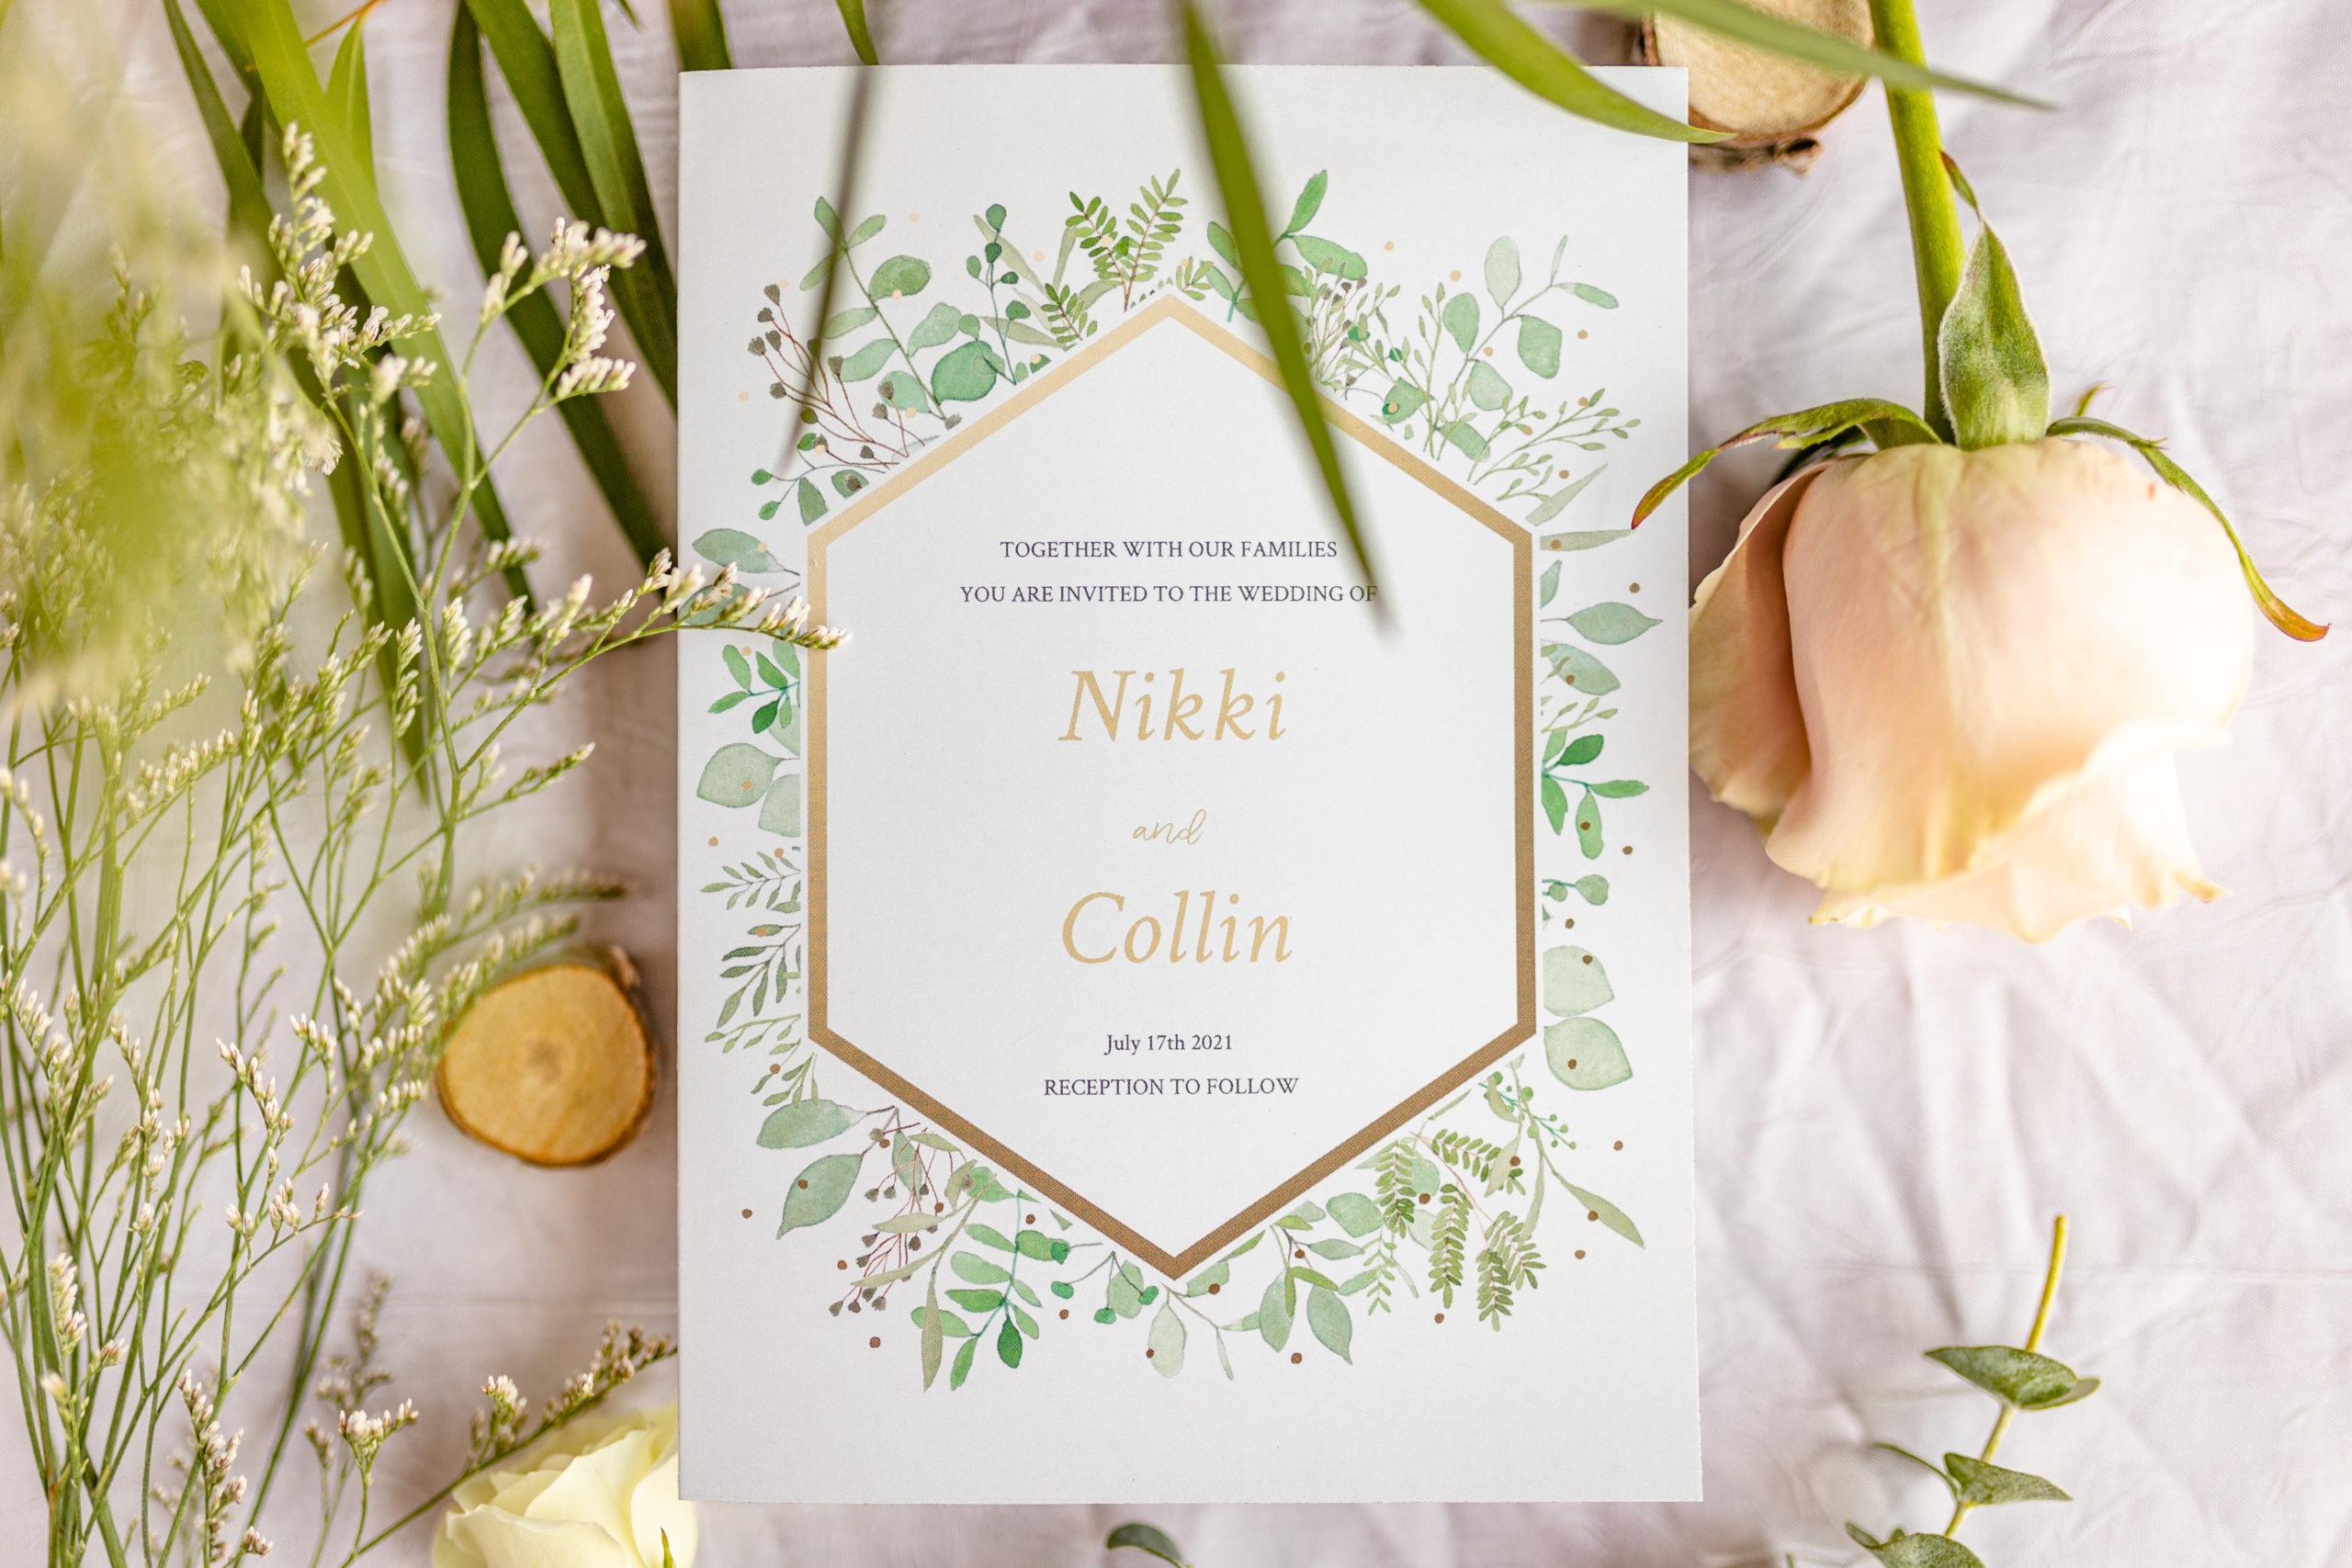 wedding photography, wedding invitation, greenery, wedding details, garden grove, carbondale, southern Illinois wedding